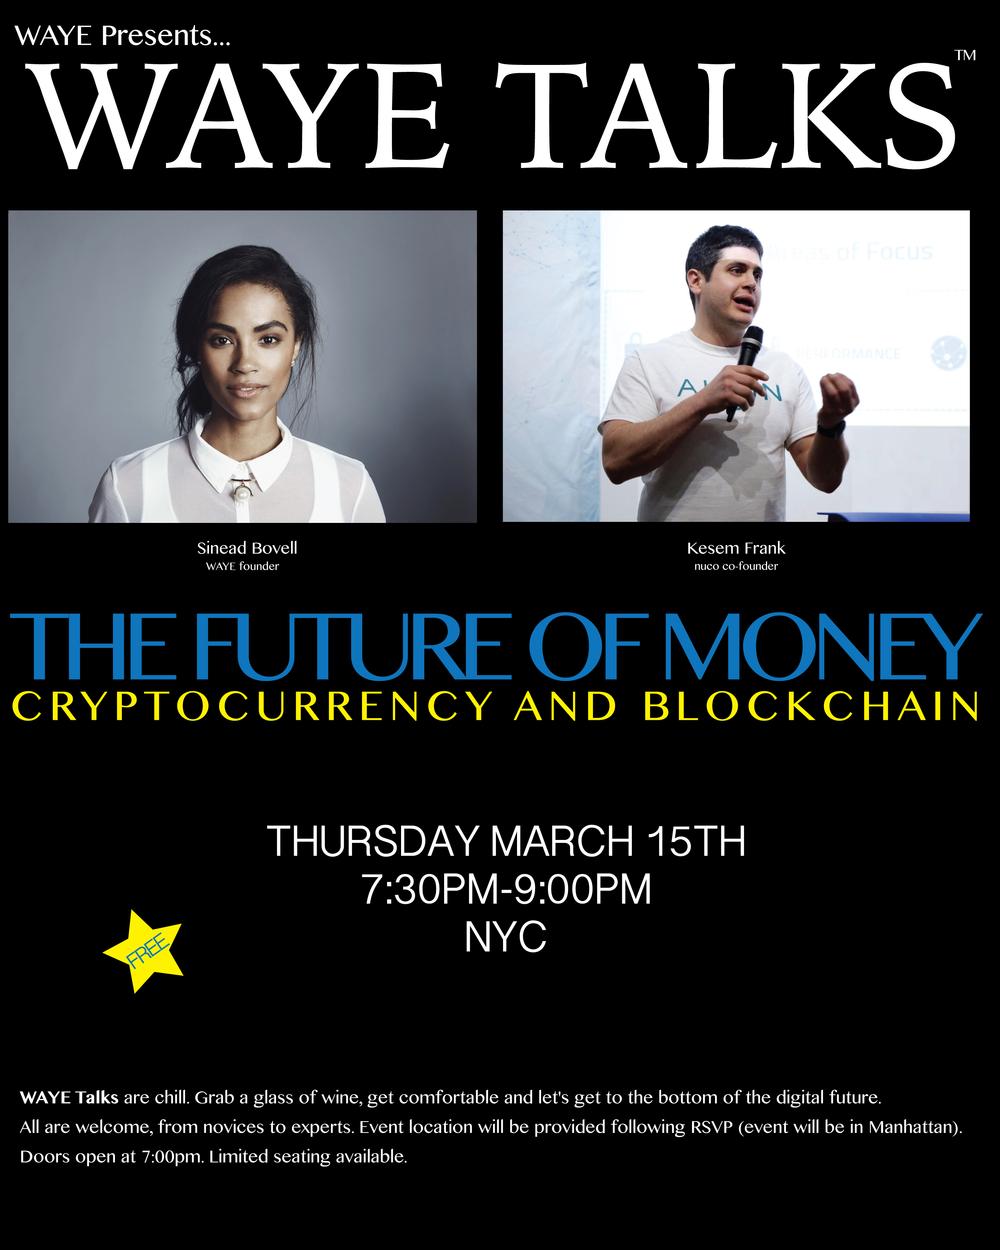 WAYE Talks - The Future of Money: Blockchain & Cryptocurrency